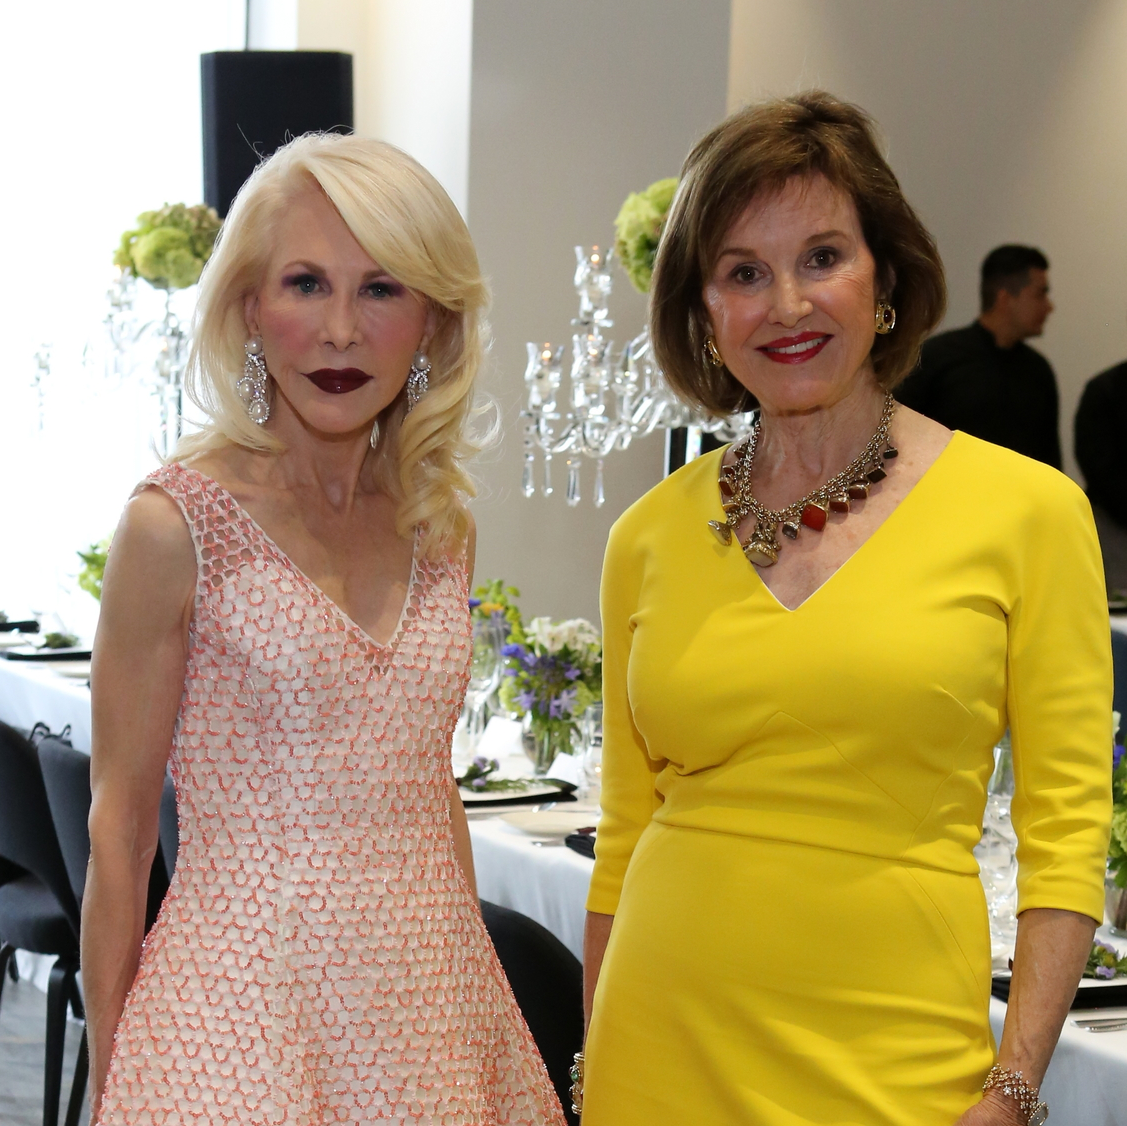 Saks Opening Dinner for HGO 4/16, Diane Lokey Farb, Donna Josey